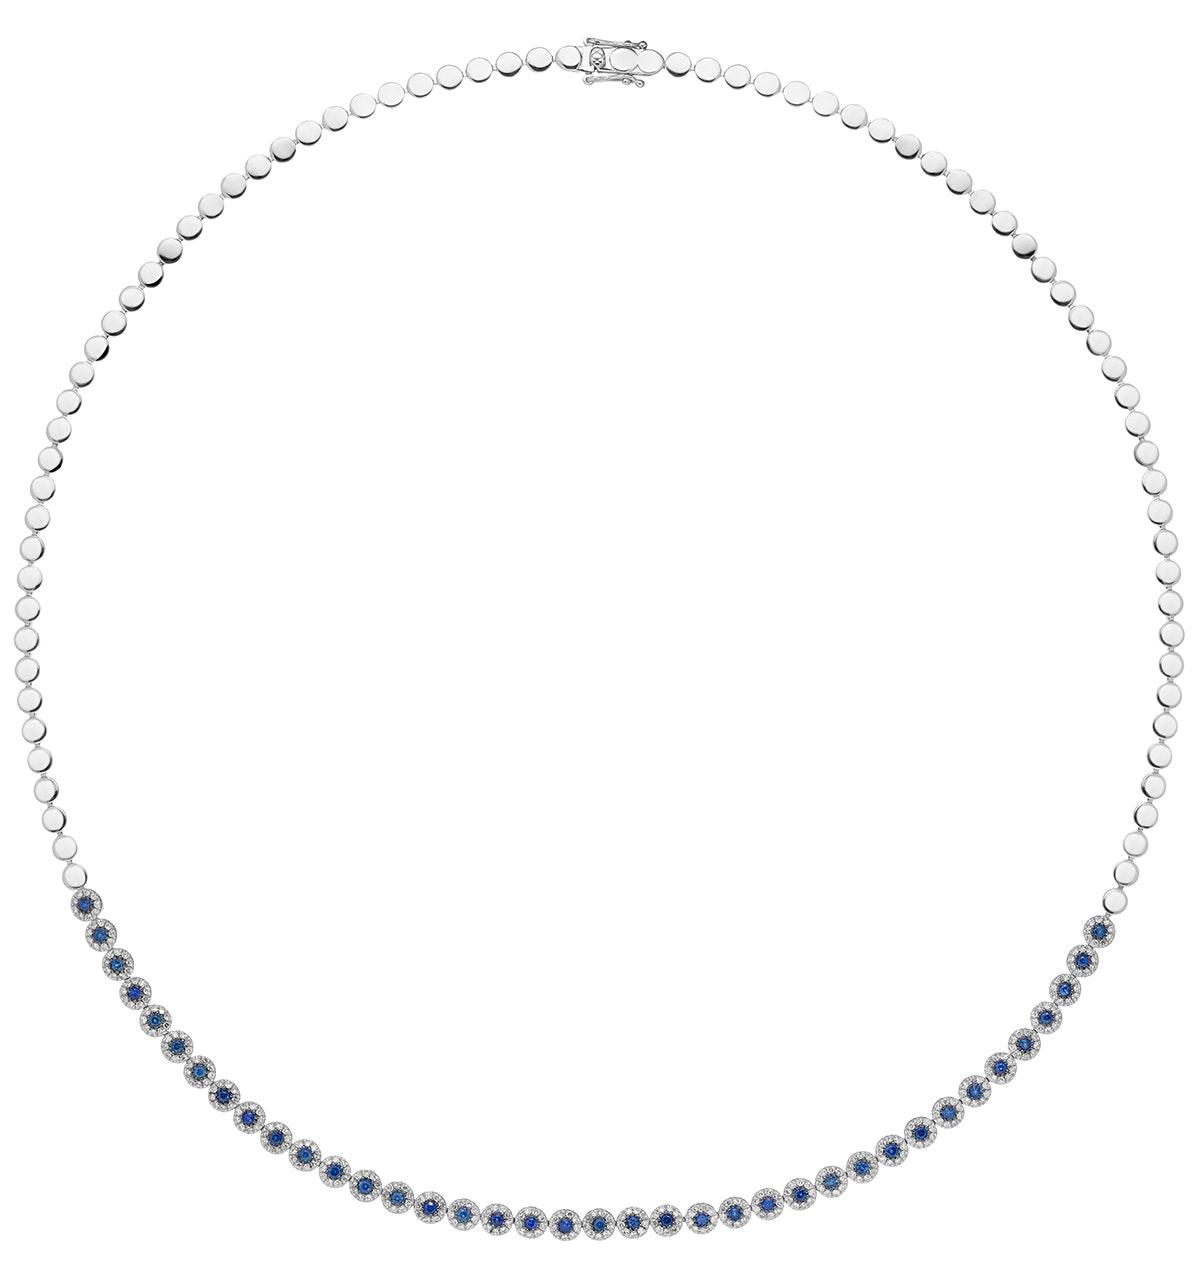 1.09ct Sapphire and Diamond Stellato Necklace in 9K White Gold